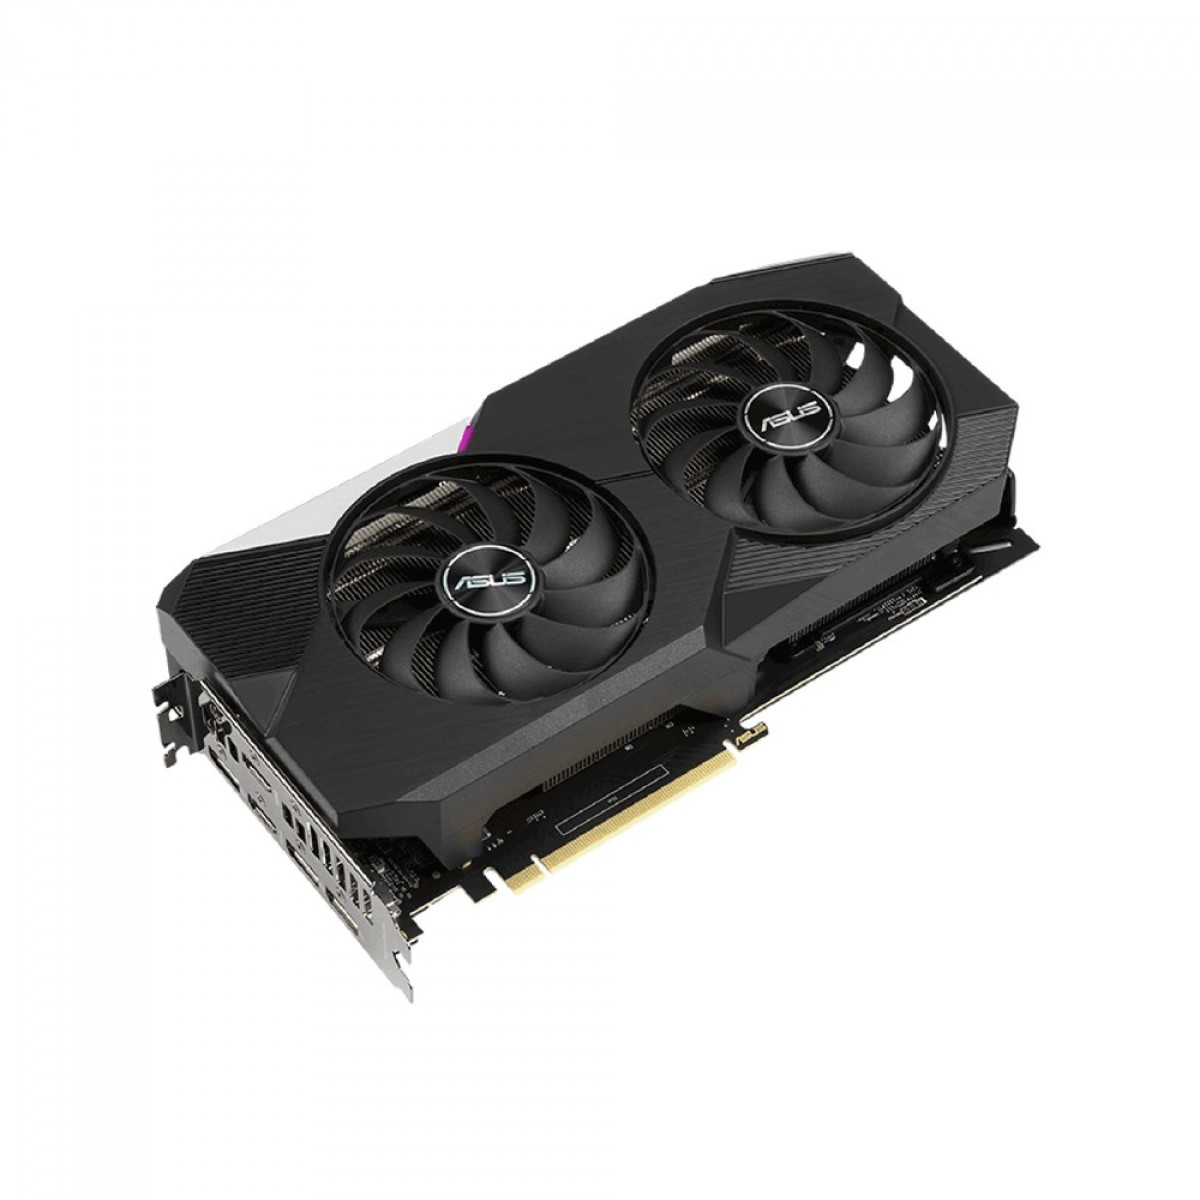 Placa de Vídeo Asus GeForce RTX 3070 DUAL, 8GB GDDR6, 256bit, DUAL-RTX3070-8G